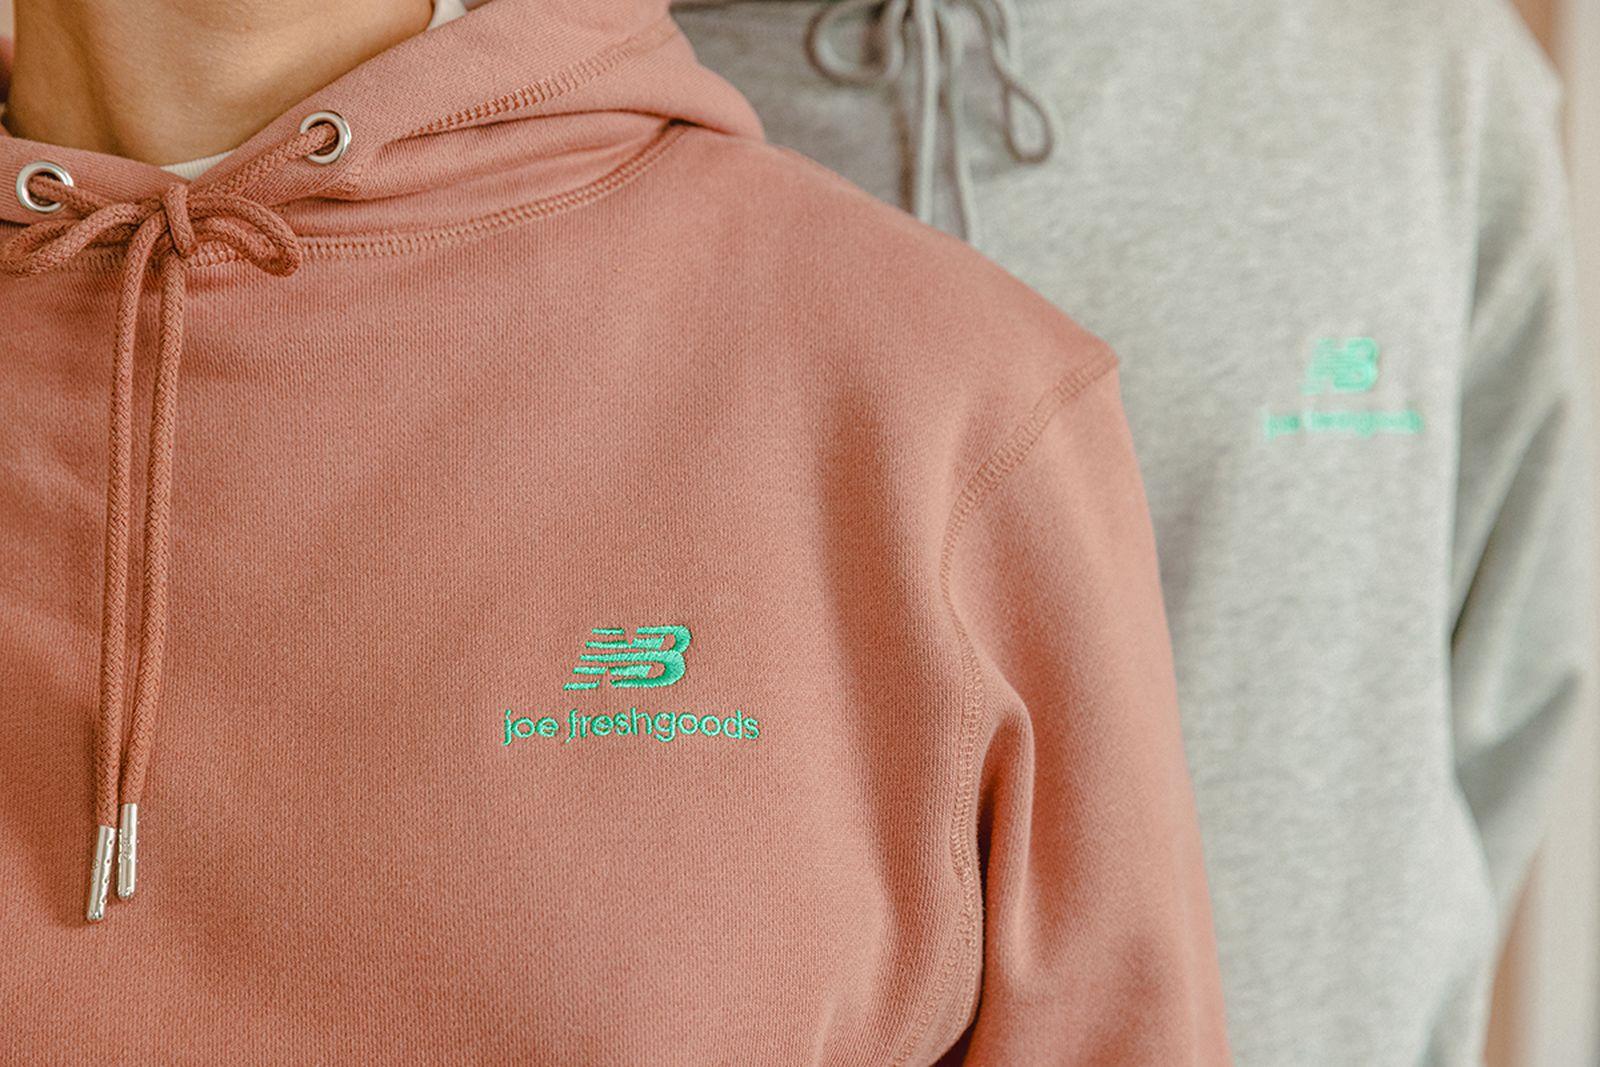 joe-freshgoods-new-balance-990v3-release-date-price-1-05